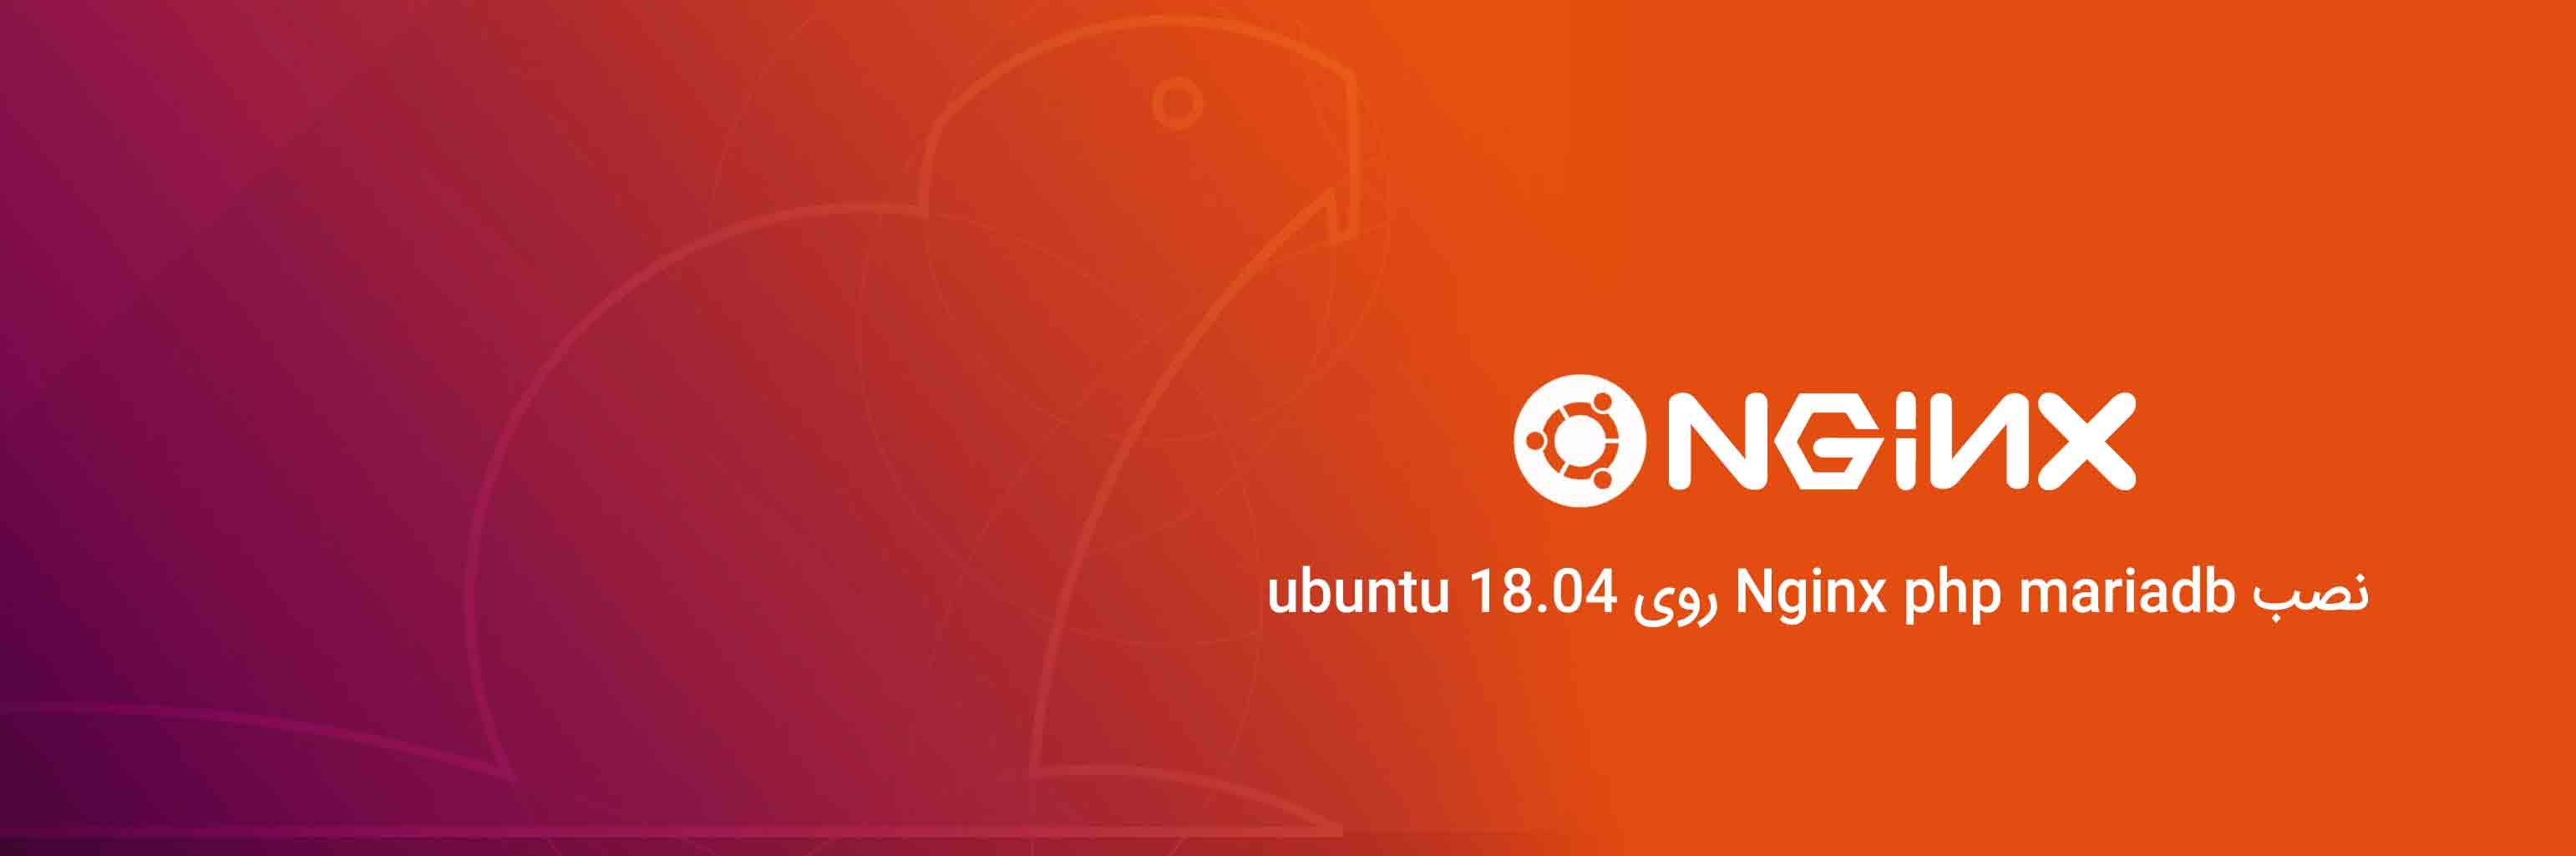 نصب Nginx php mariadb روی ubuntu 18.04